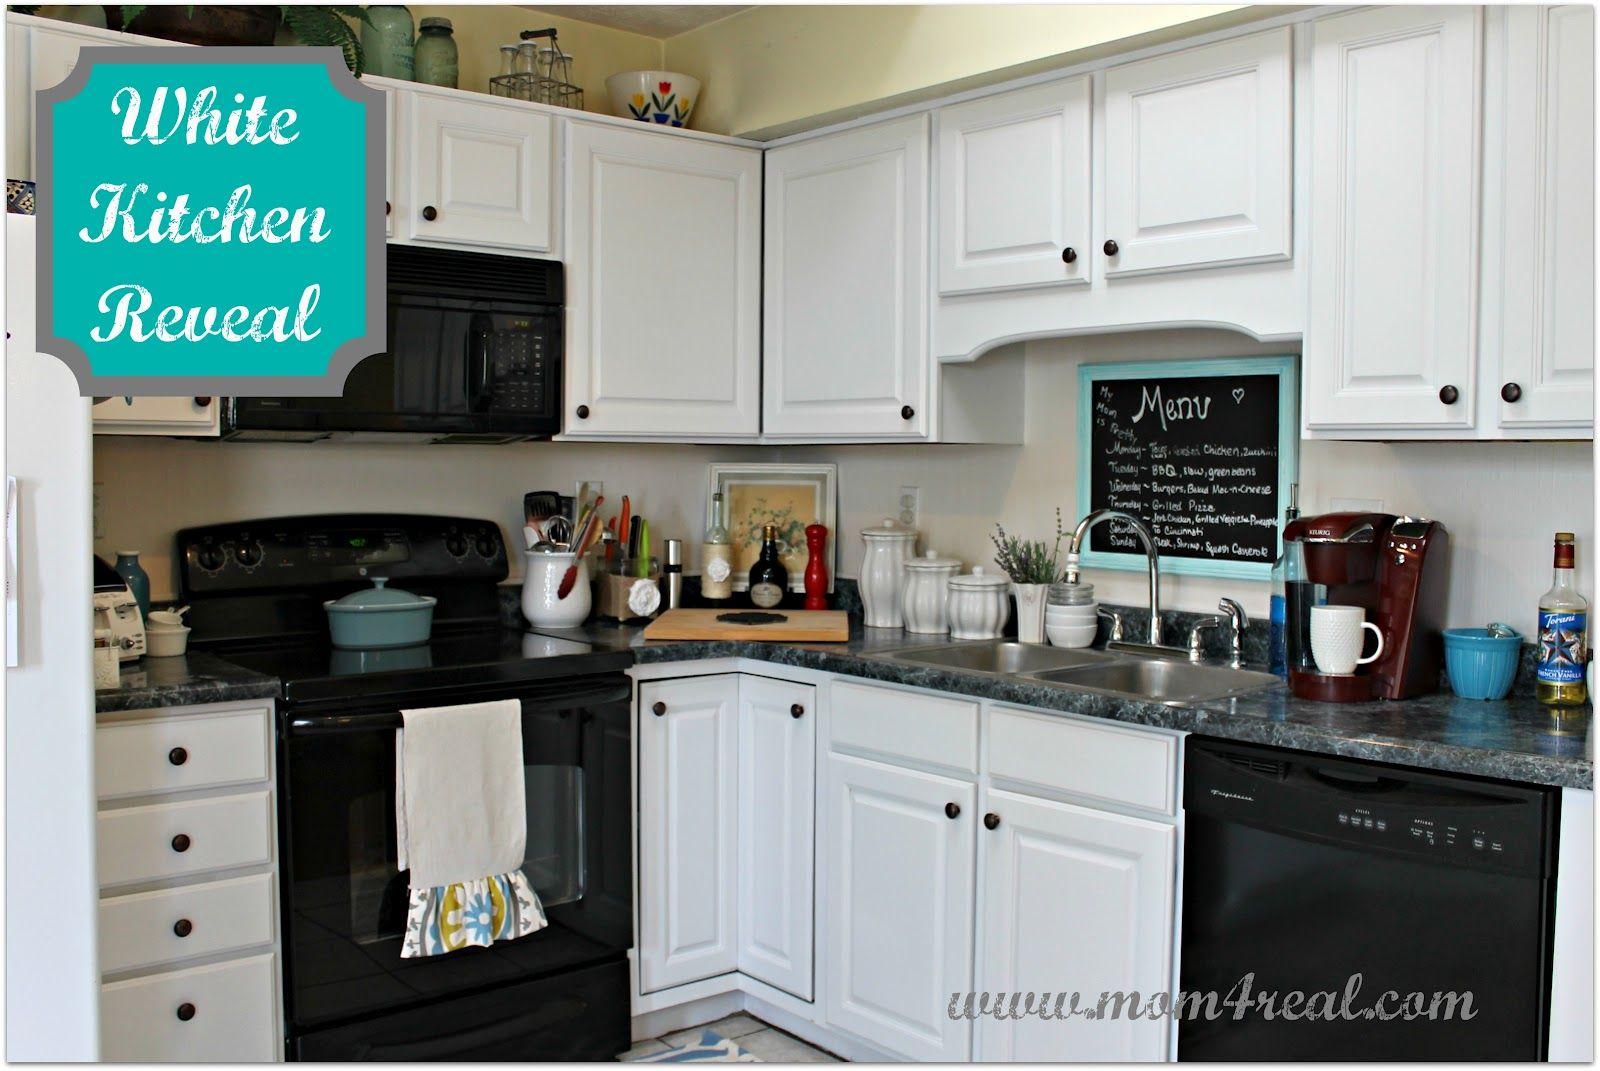 Download Wallpaper White And Gray Kitchen Black Appliances